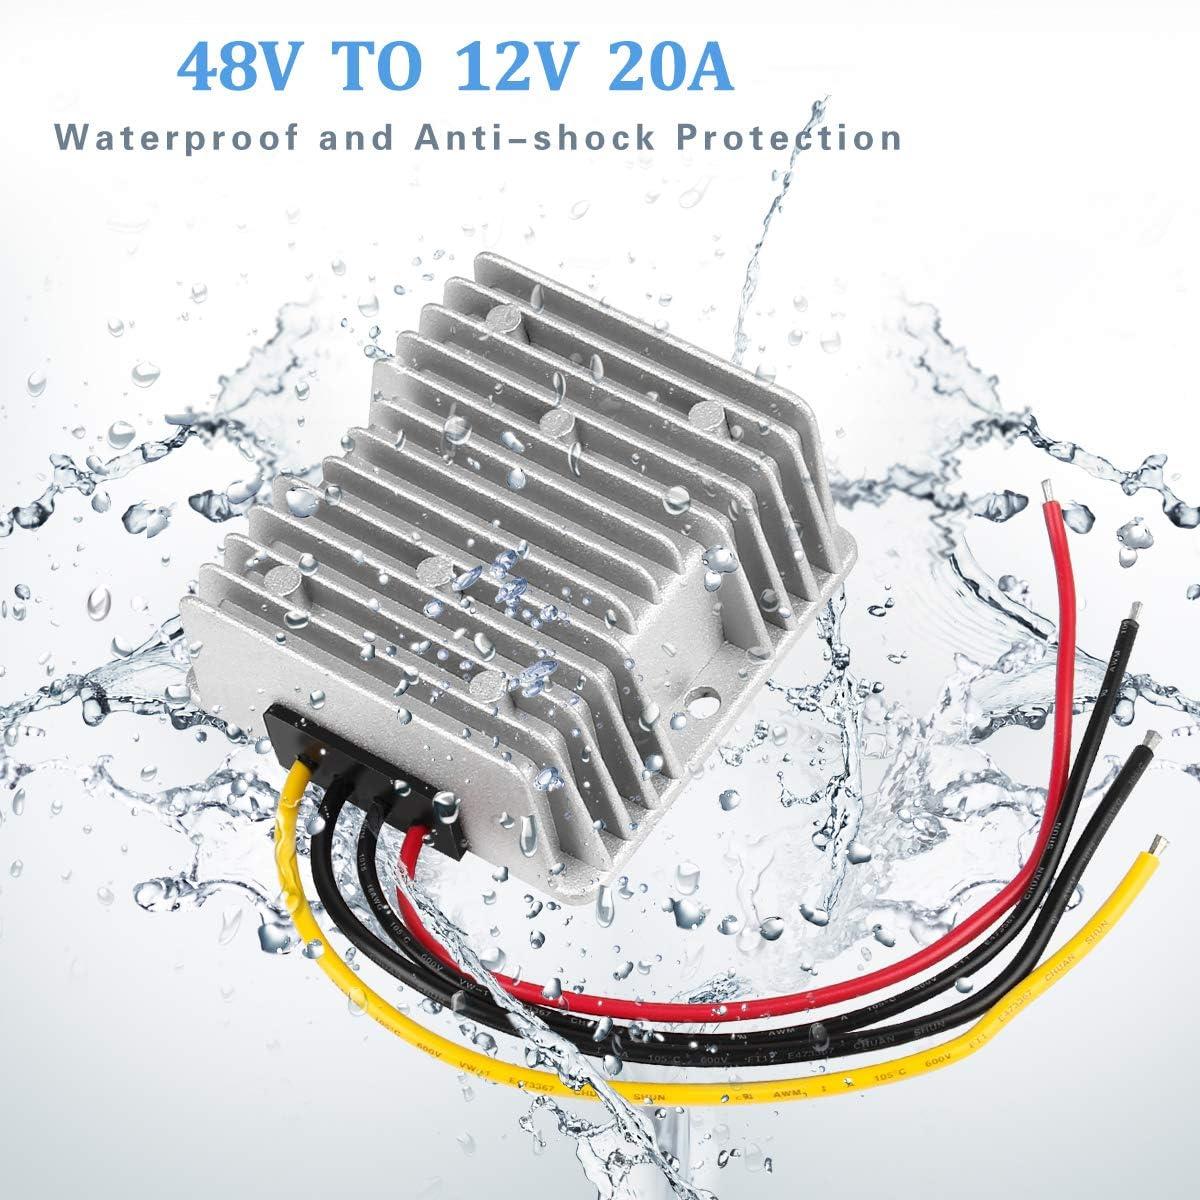 48v To 12v Converter Wiring Diagram: 36 Volt Ezgo Wiring Diagram E 301